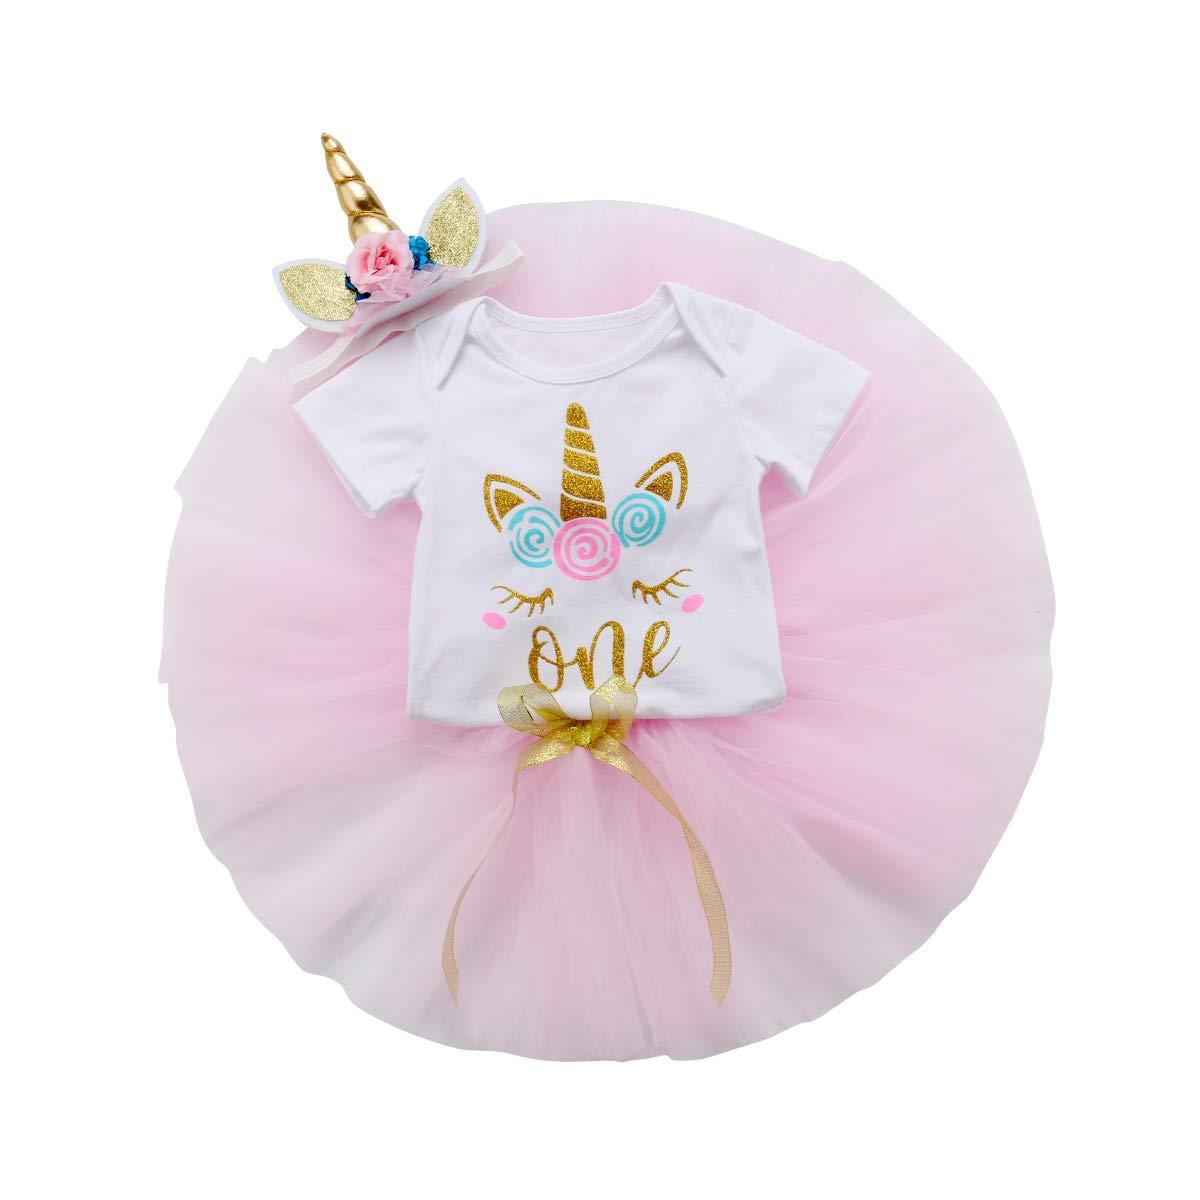 4725be1ca 3PCS Unicorn Outfit Newborn Baby Girls 1st Birthday Romper + Tutu ...